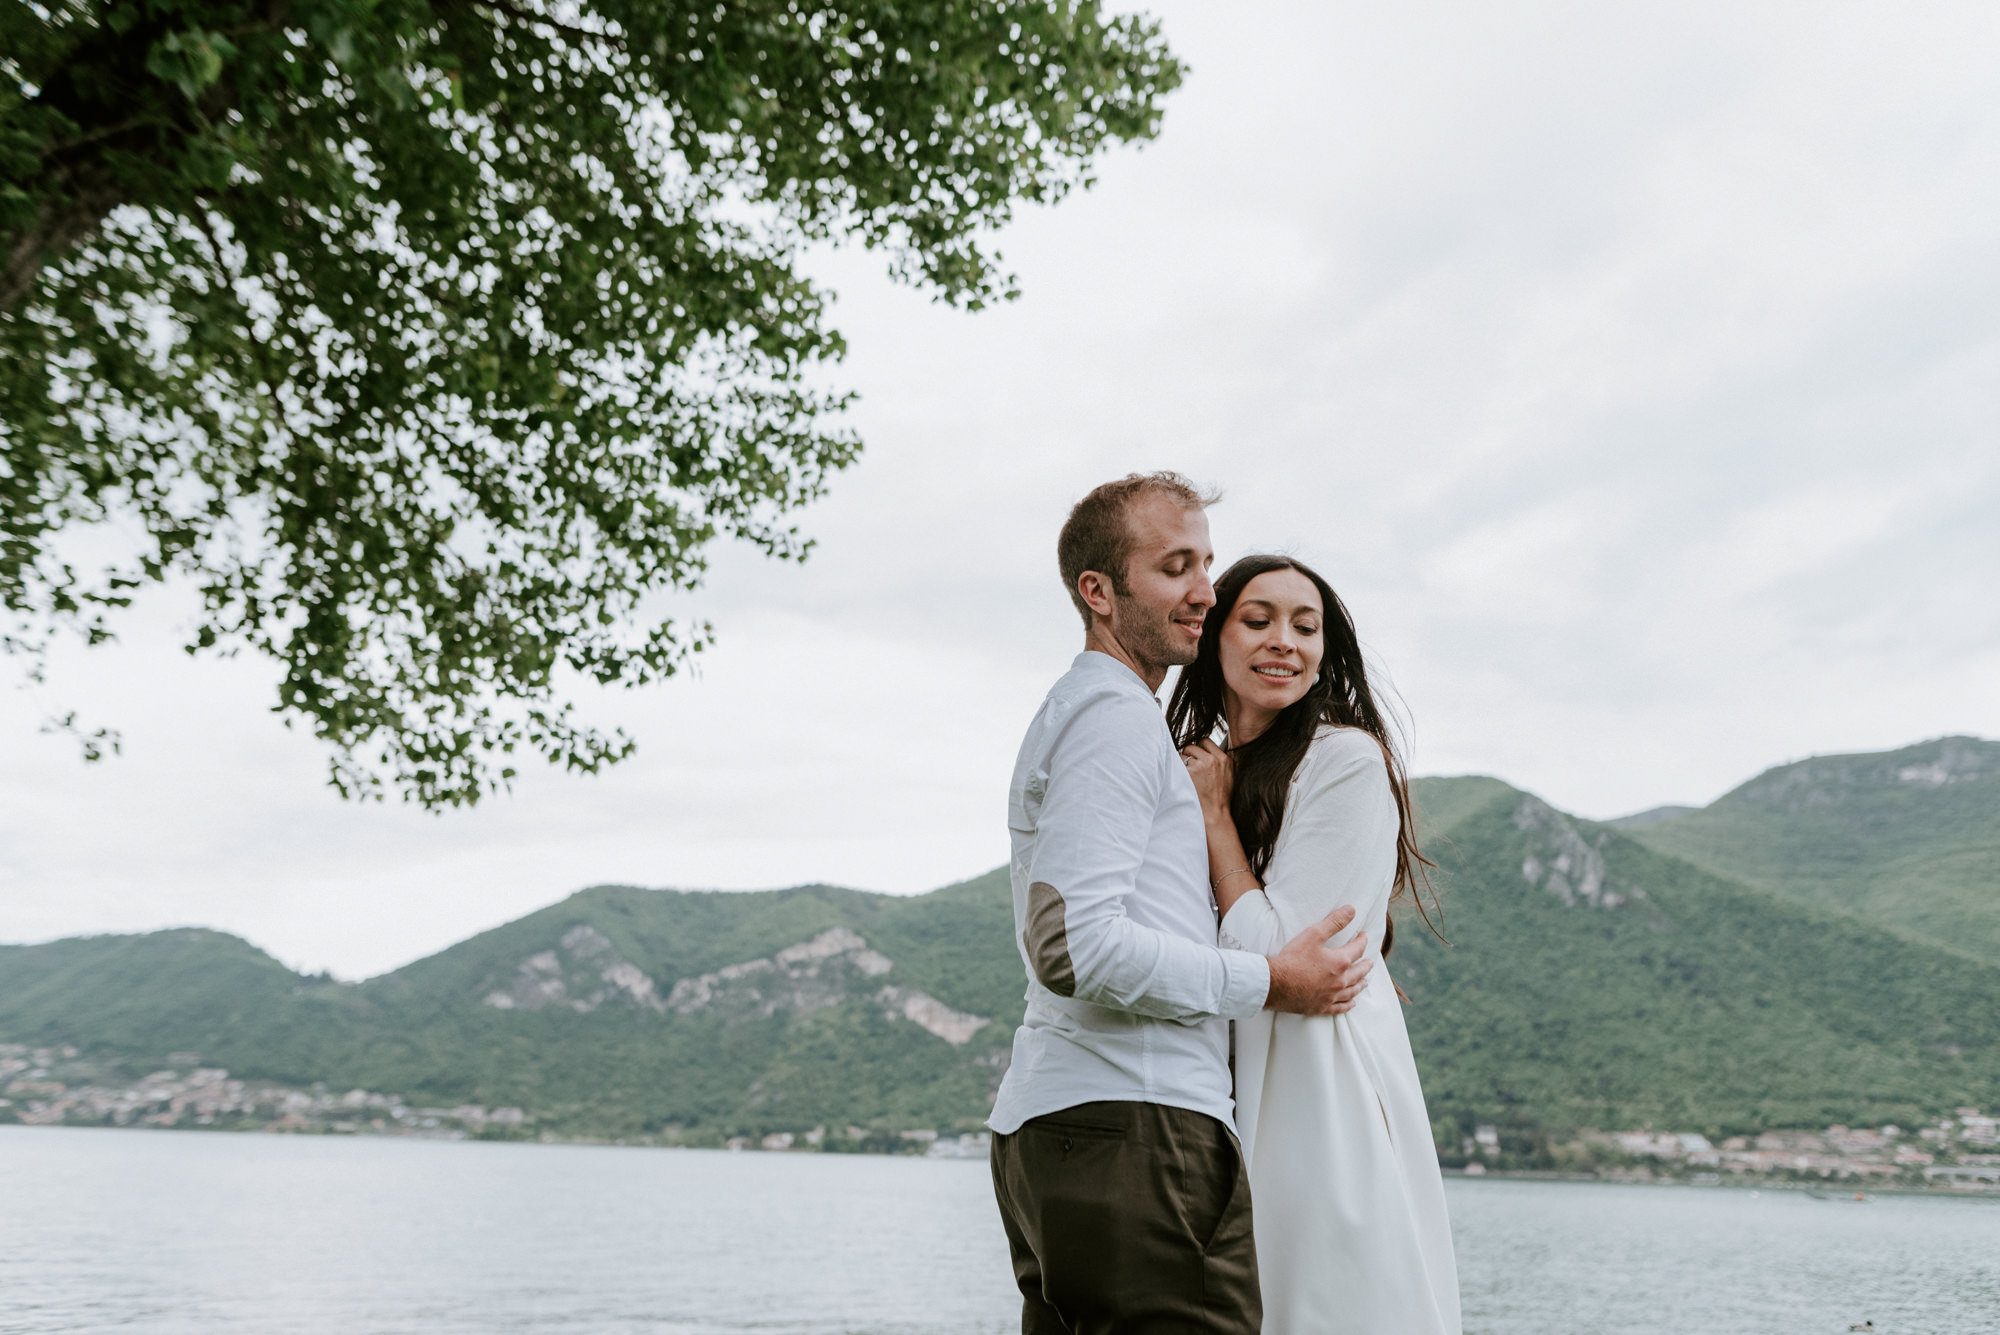 FOTO+PHOTO+BODA+WEDDING+ITALIA+ITALY+MAURICIO+GARAY+MAURICIOGARAY+WEDDINPHOTOGRAPHER+FOTOGRAFODEBODA-2436.jpg